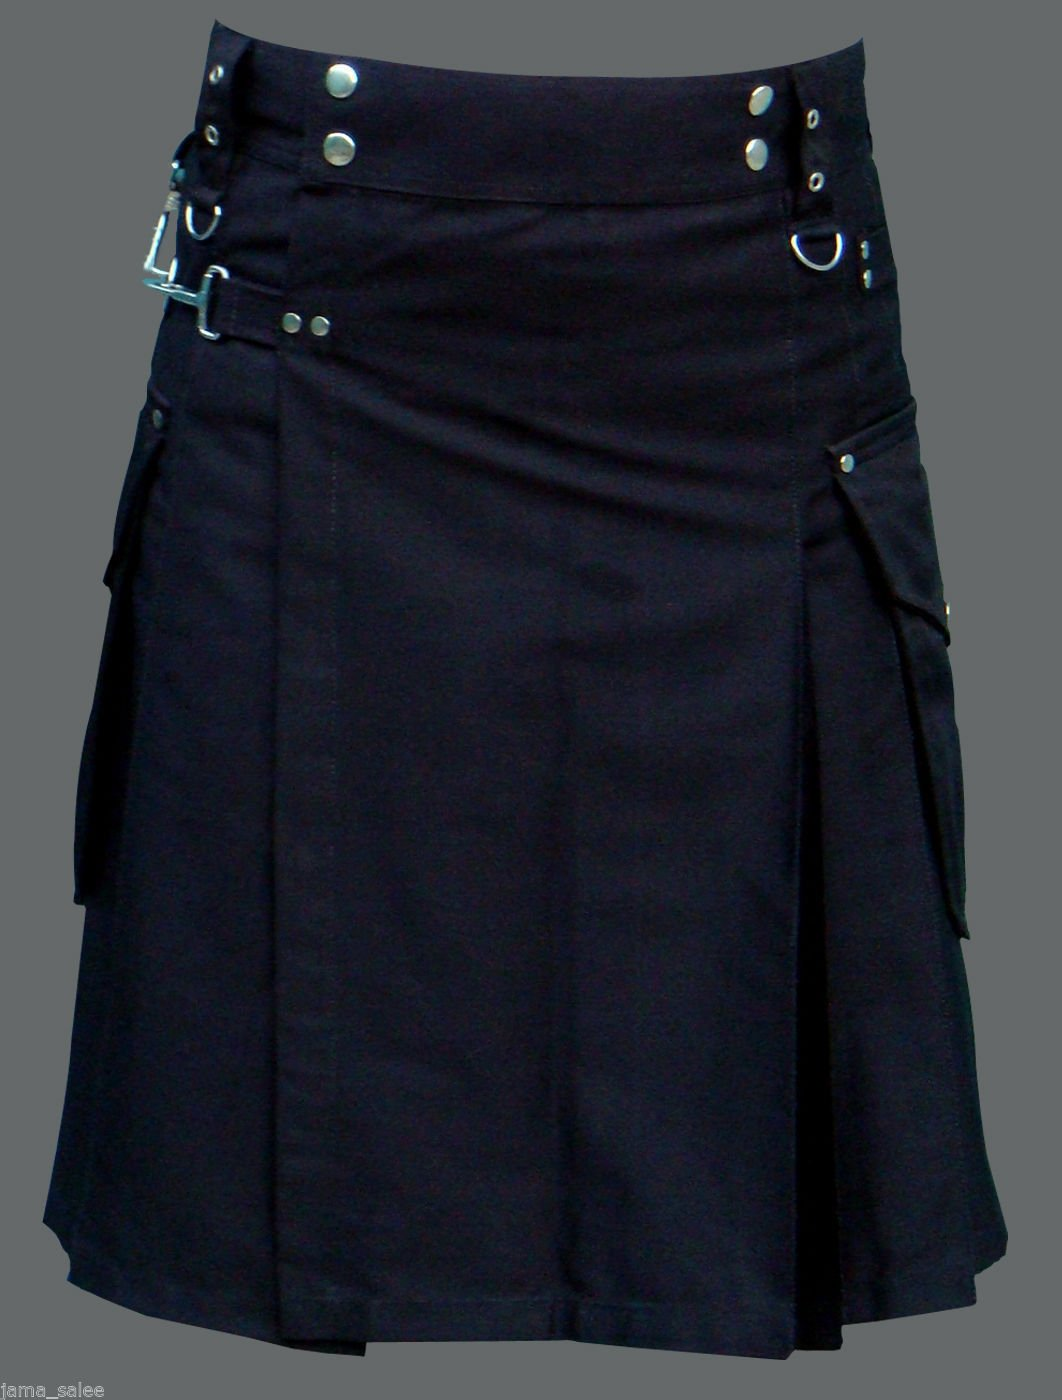 Deluxe Black Cotton Kilt Handmade Utility Gothic Modern Kilt with Cargo Pockets Waist Size 28 to Fit